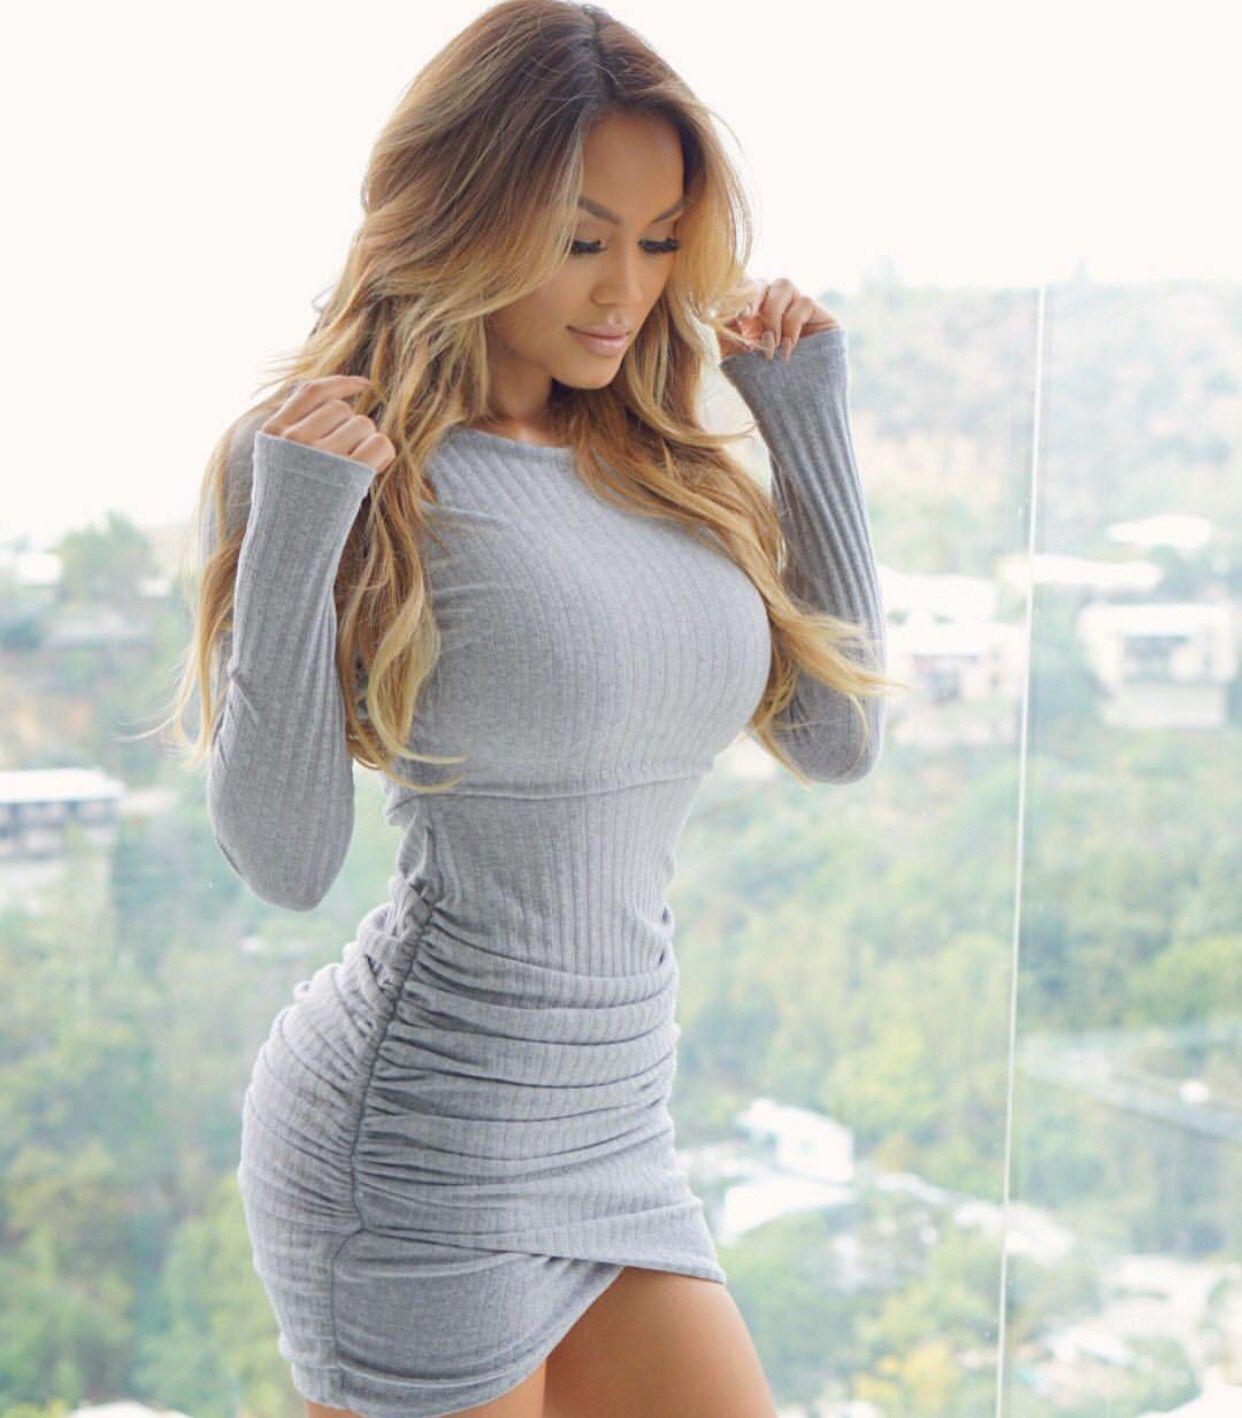 best of Webcam Goddess Blonde